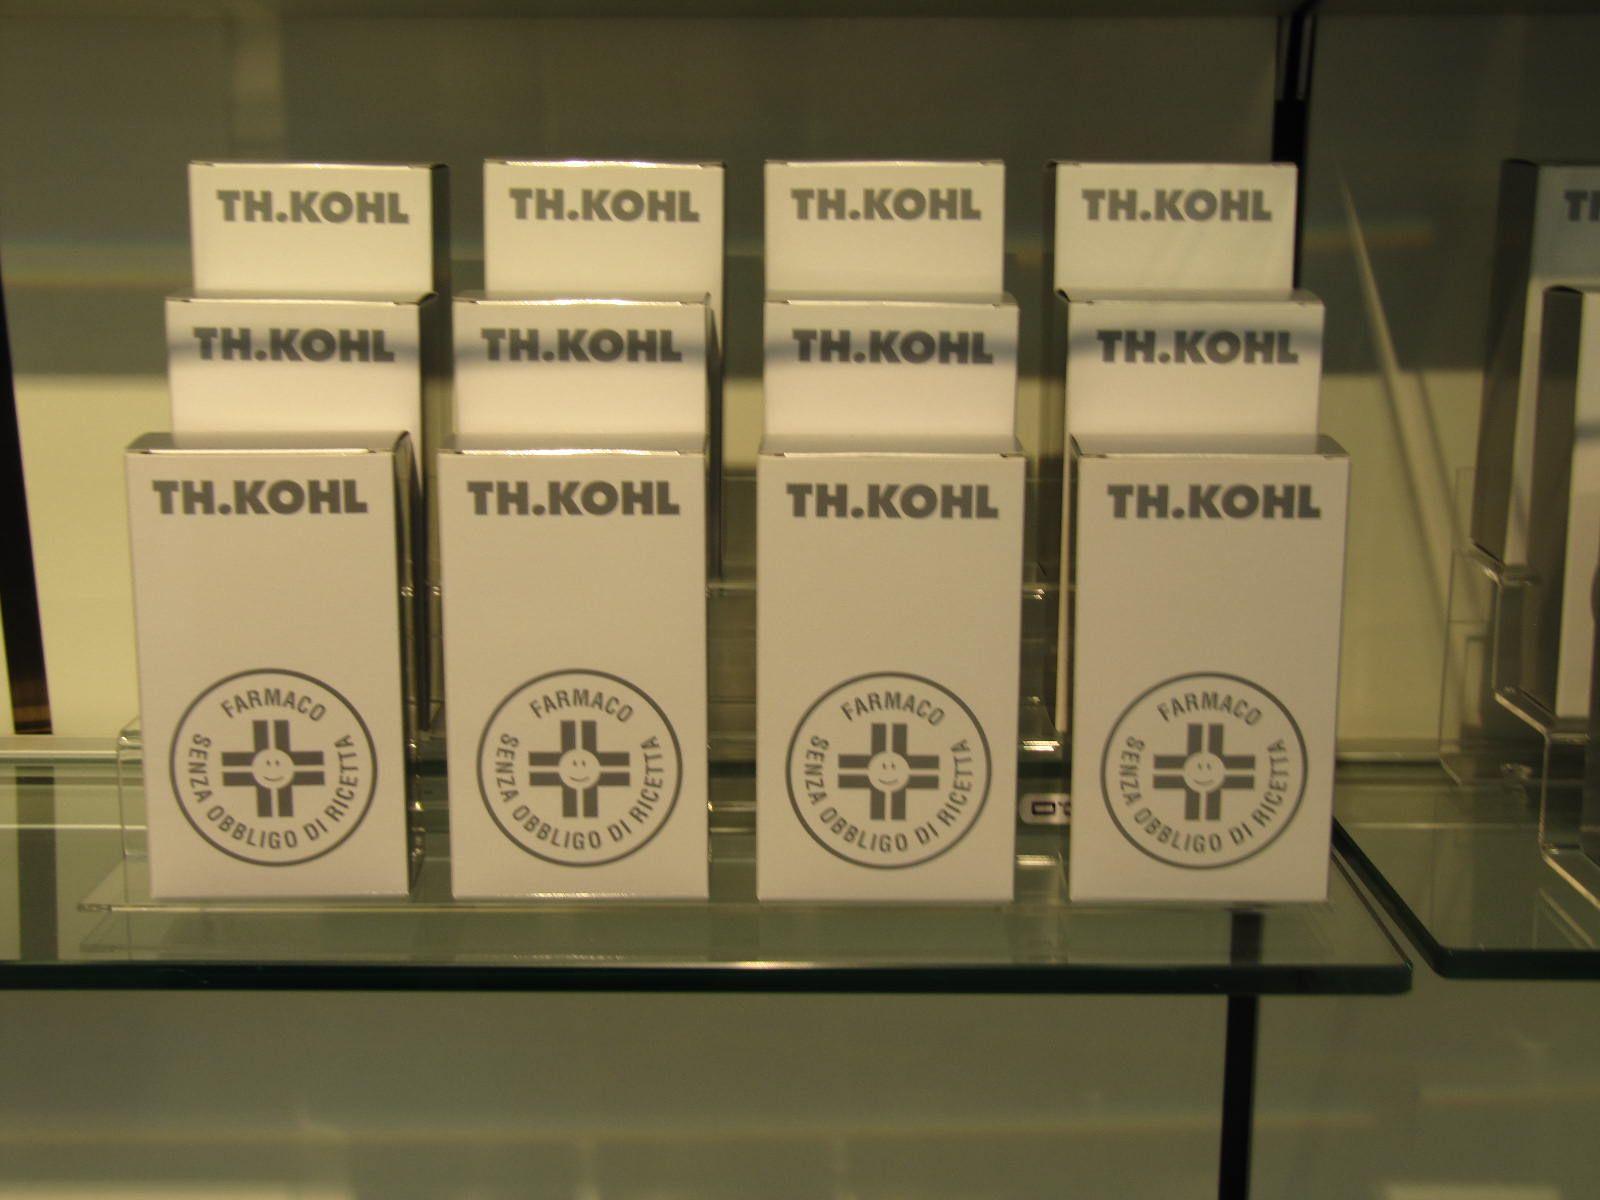 Presentazione Di Otc In Farmacia Pharmacy Category Management  # Kohl Muebles Farmacia